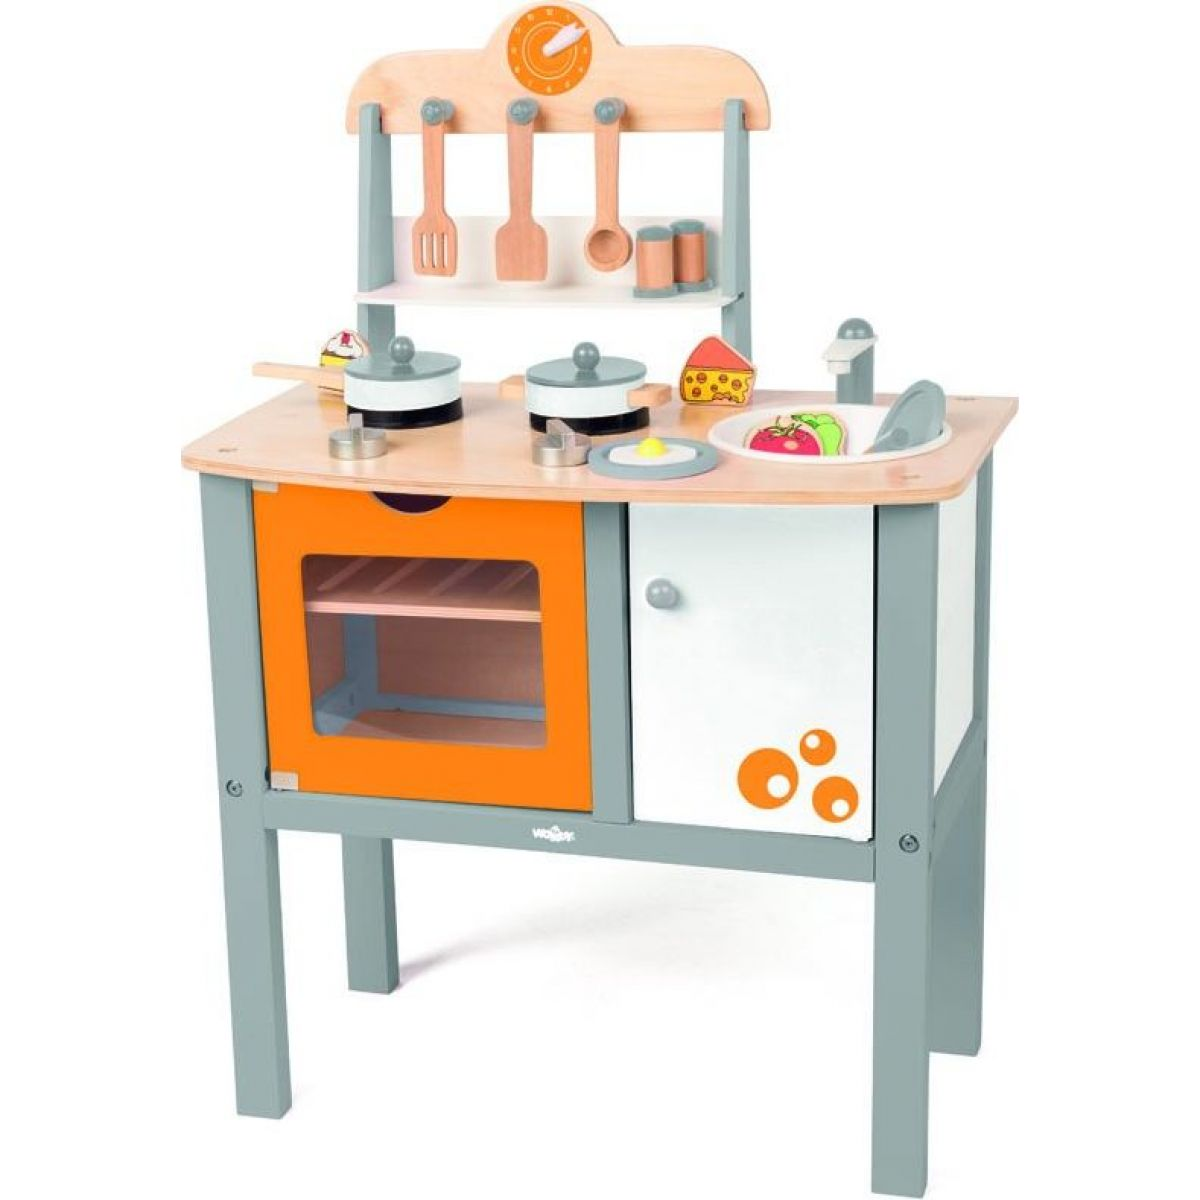 Woody Kuchynka malá Buona cucina